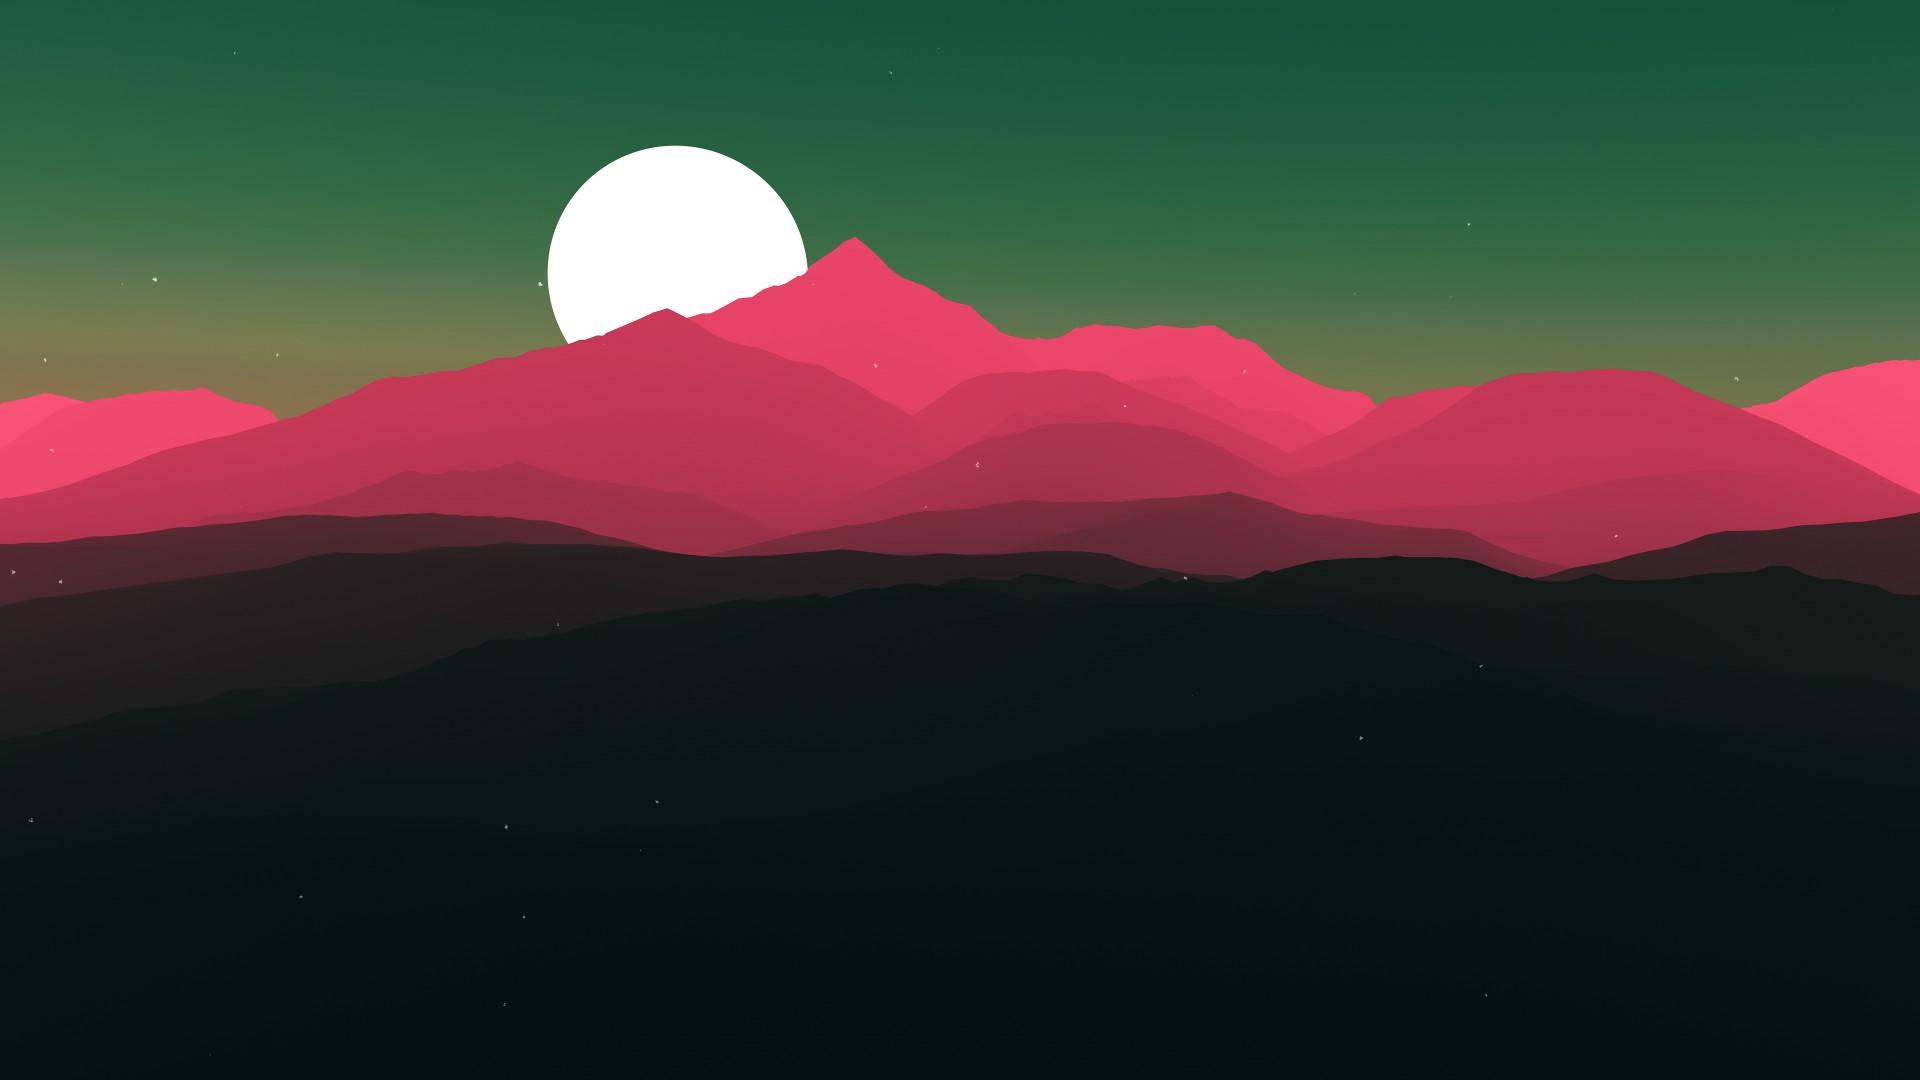 Minimalist Cute Desktop Wallpaper Moon Sun Minimal Artwork 4k Wallpapers Hd Wallpapers